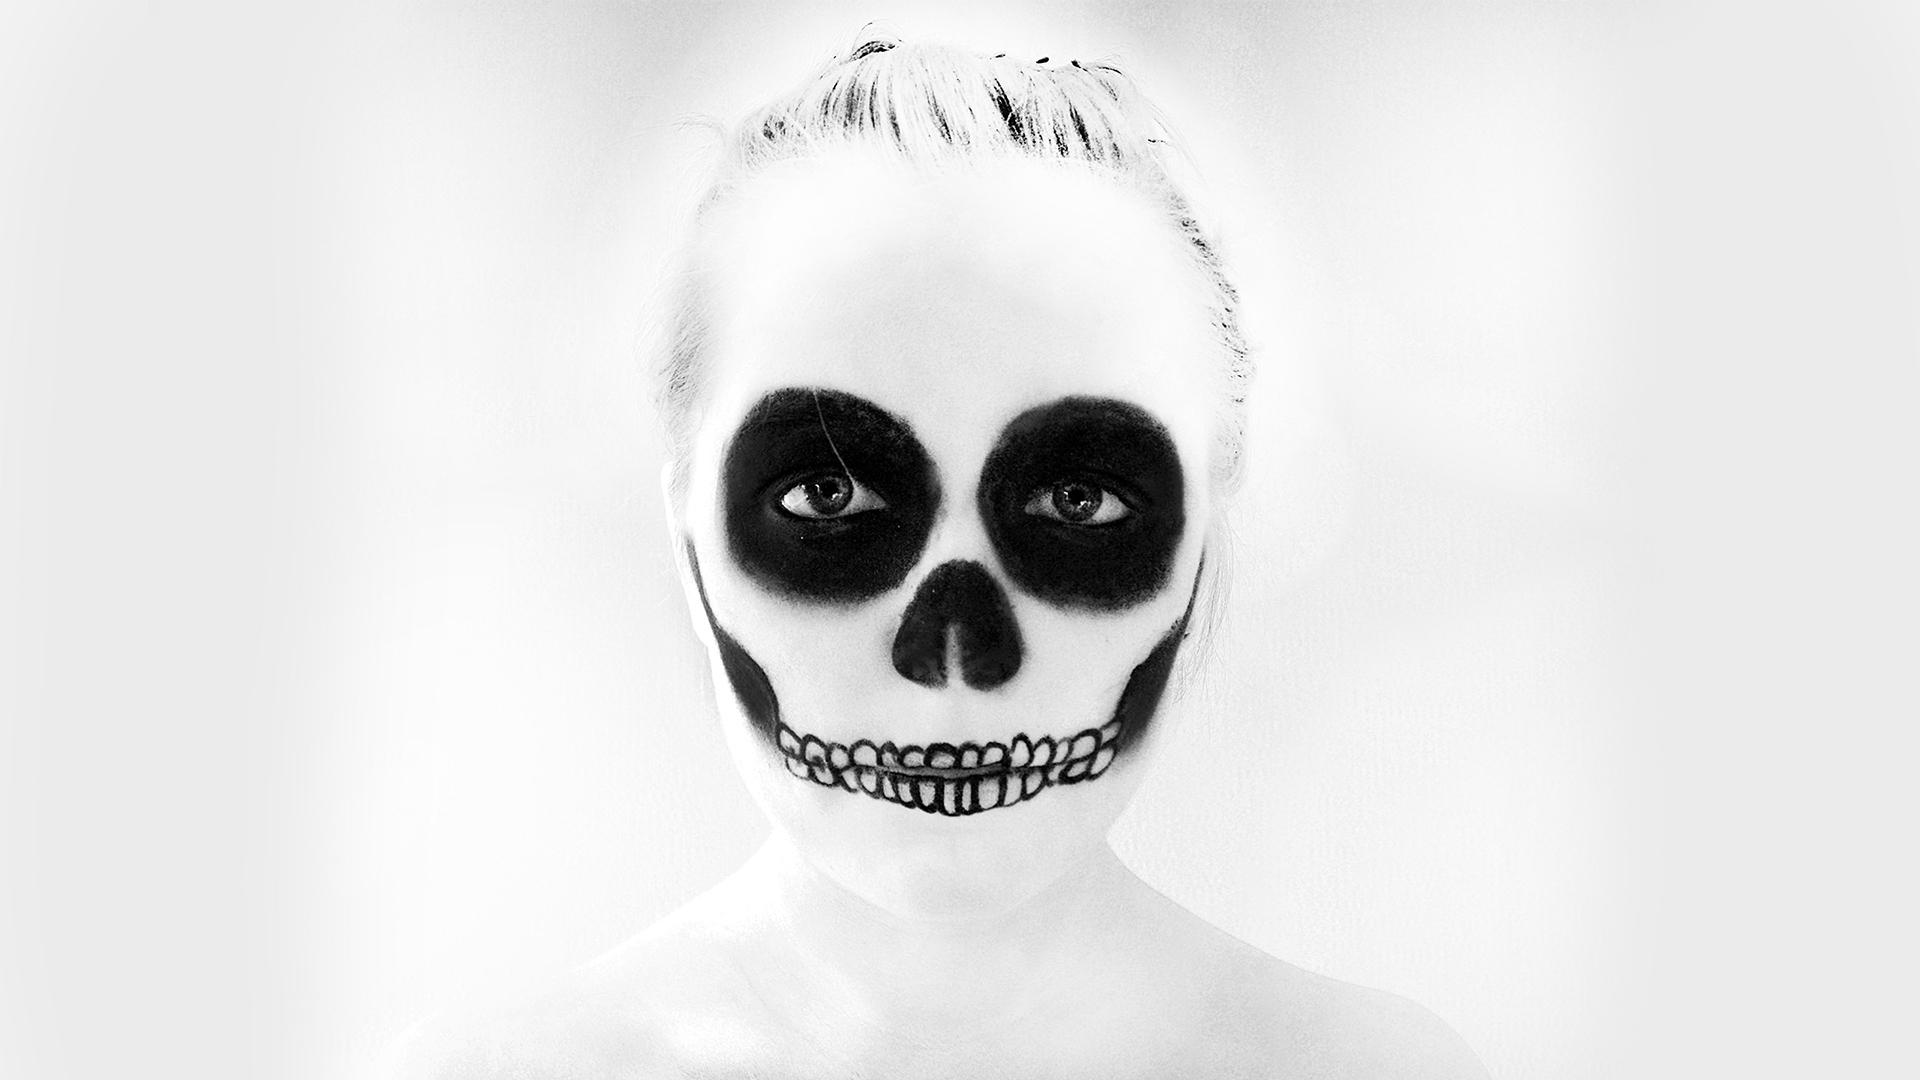 Fantastic Wallpaper Halloween Skull - b07adb3bc941ade38aa5a278b35f3b54  Photograph_778168.jpg